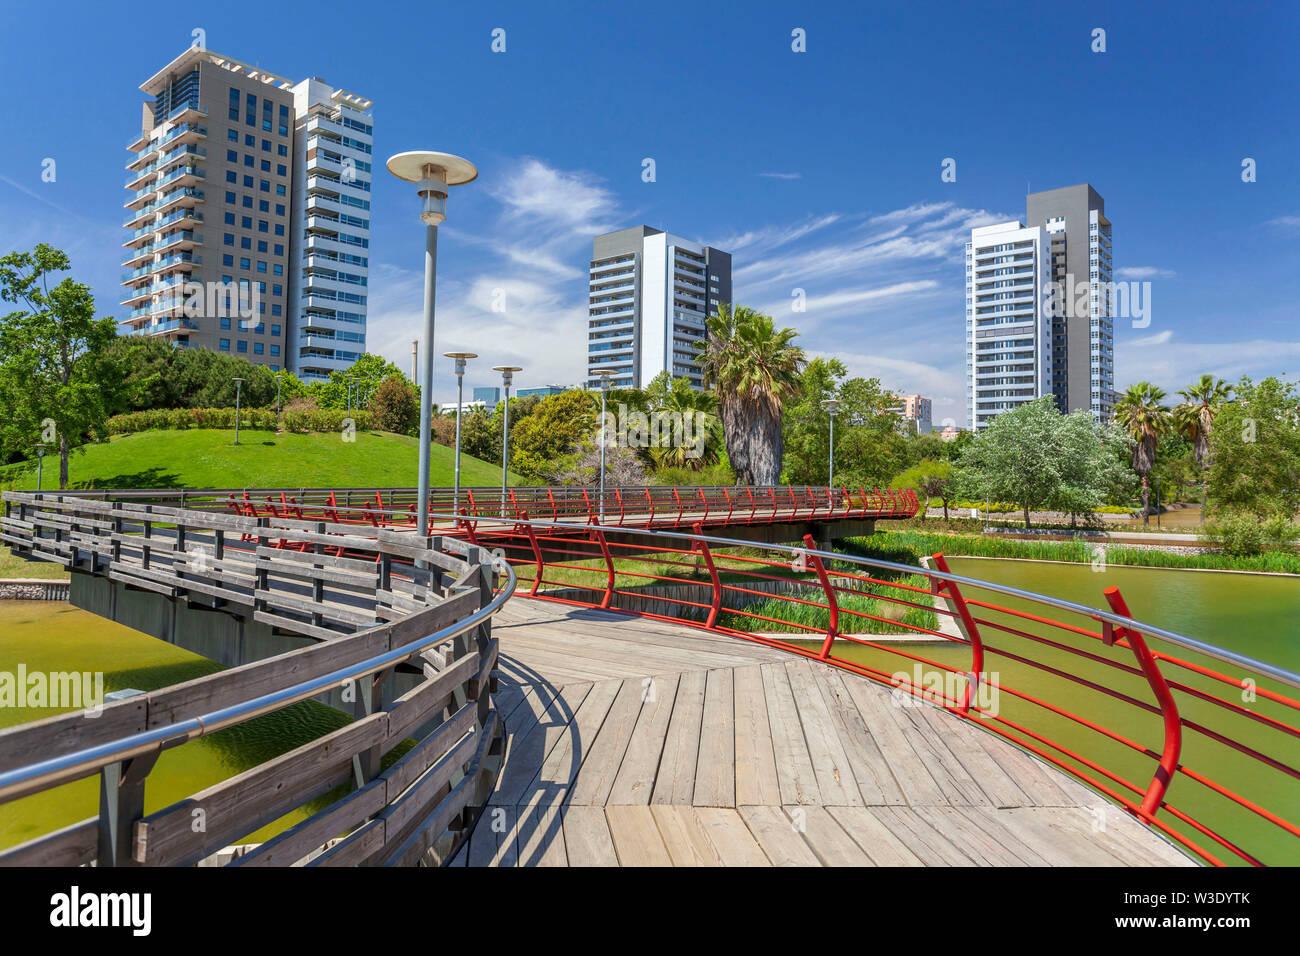 Diagonal Mar park,designed by Enric Miralles and Benedetta Tagliabue. Barcelona, Catalonia, Spain. Stock Photo